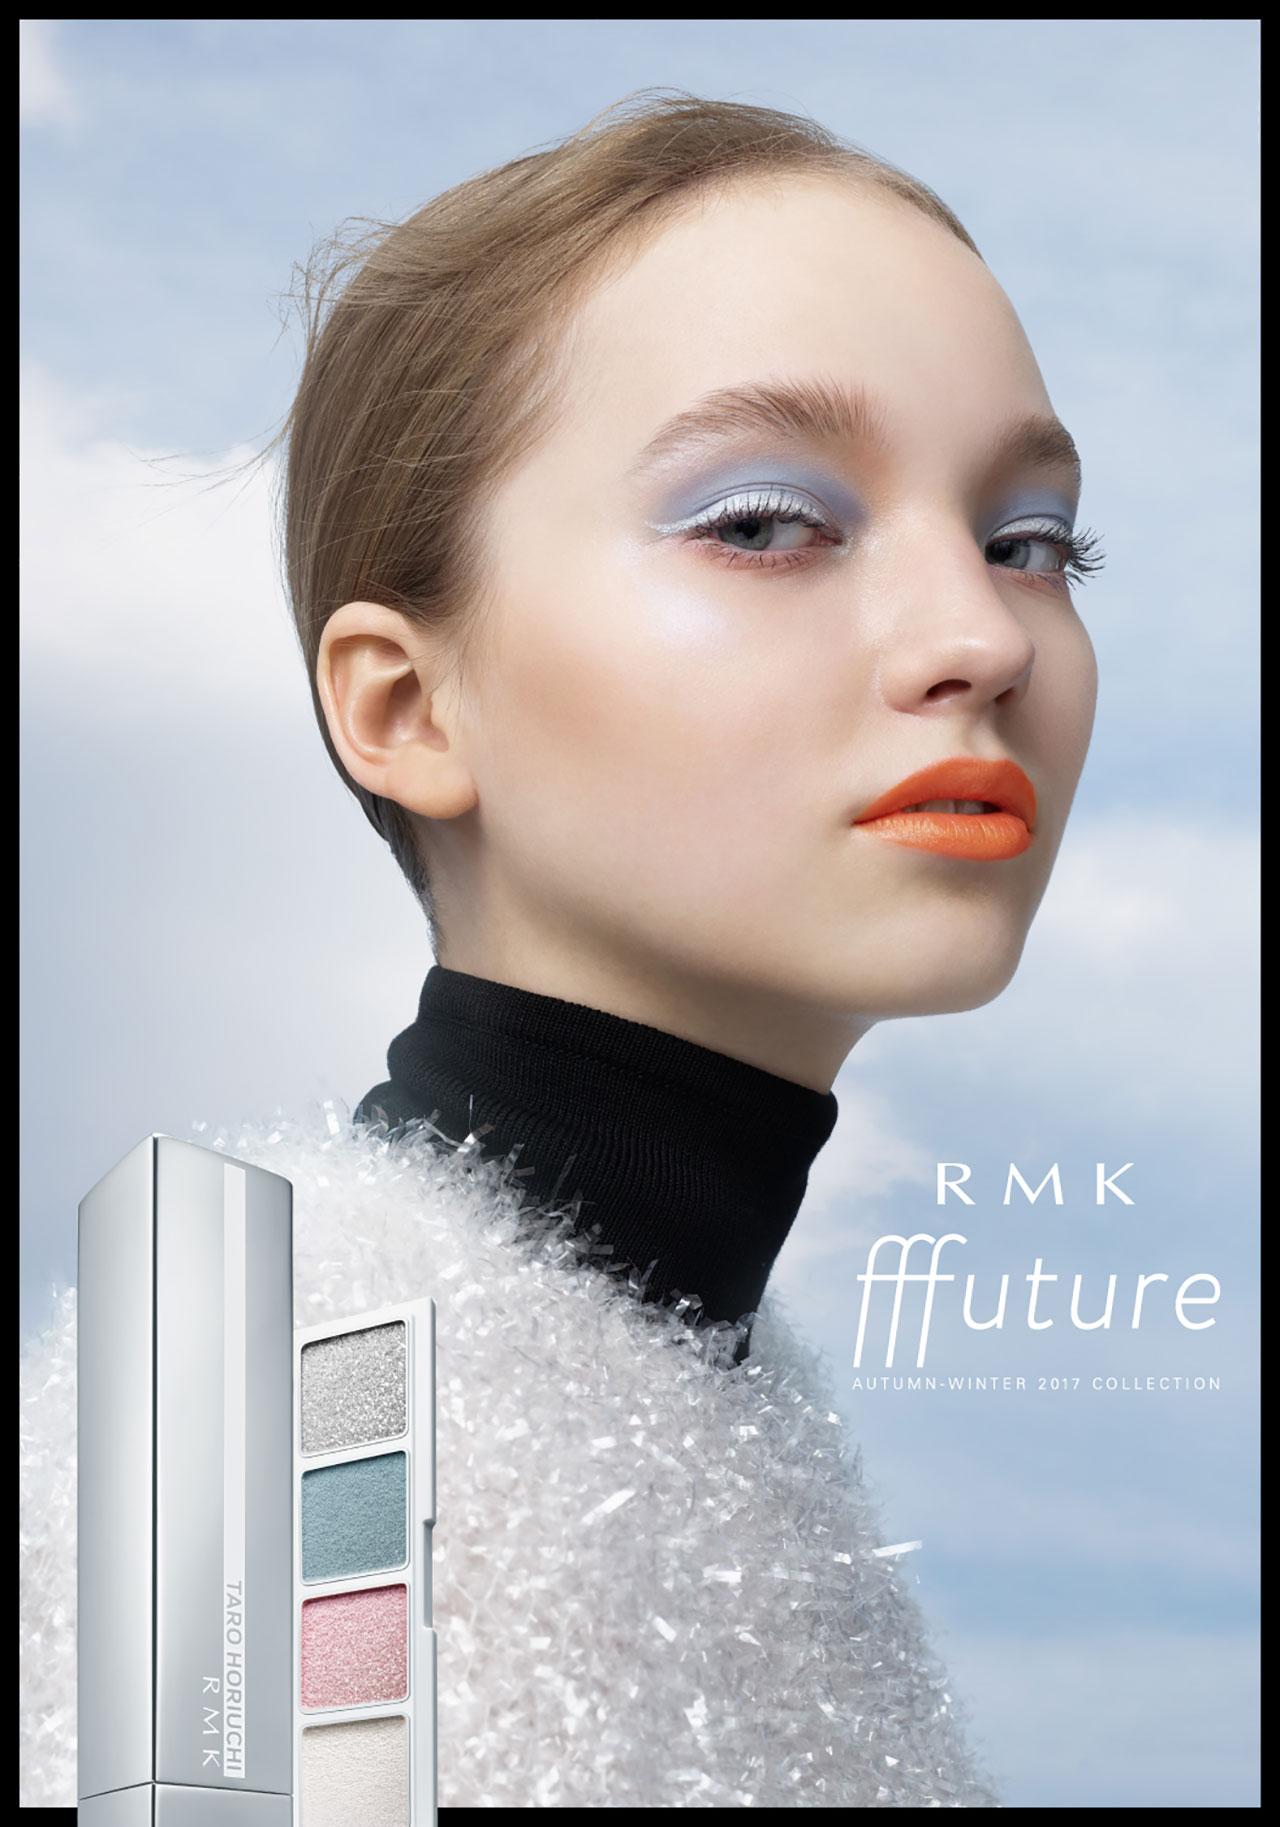 RMK fffuture Autumn-Winter 2017 Collection   ©︎ RMK